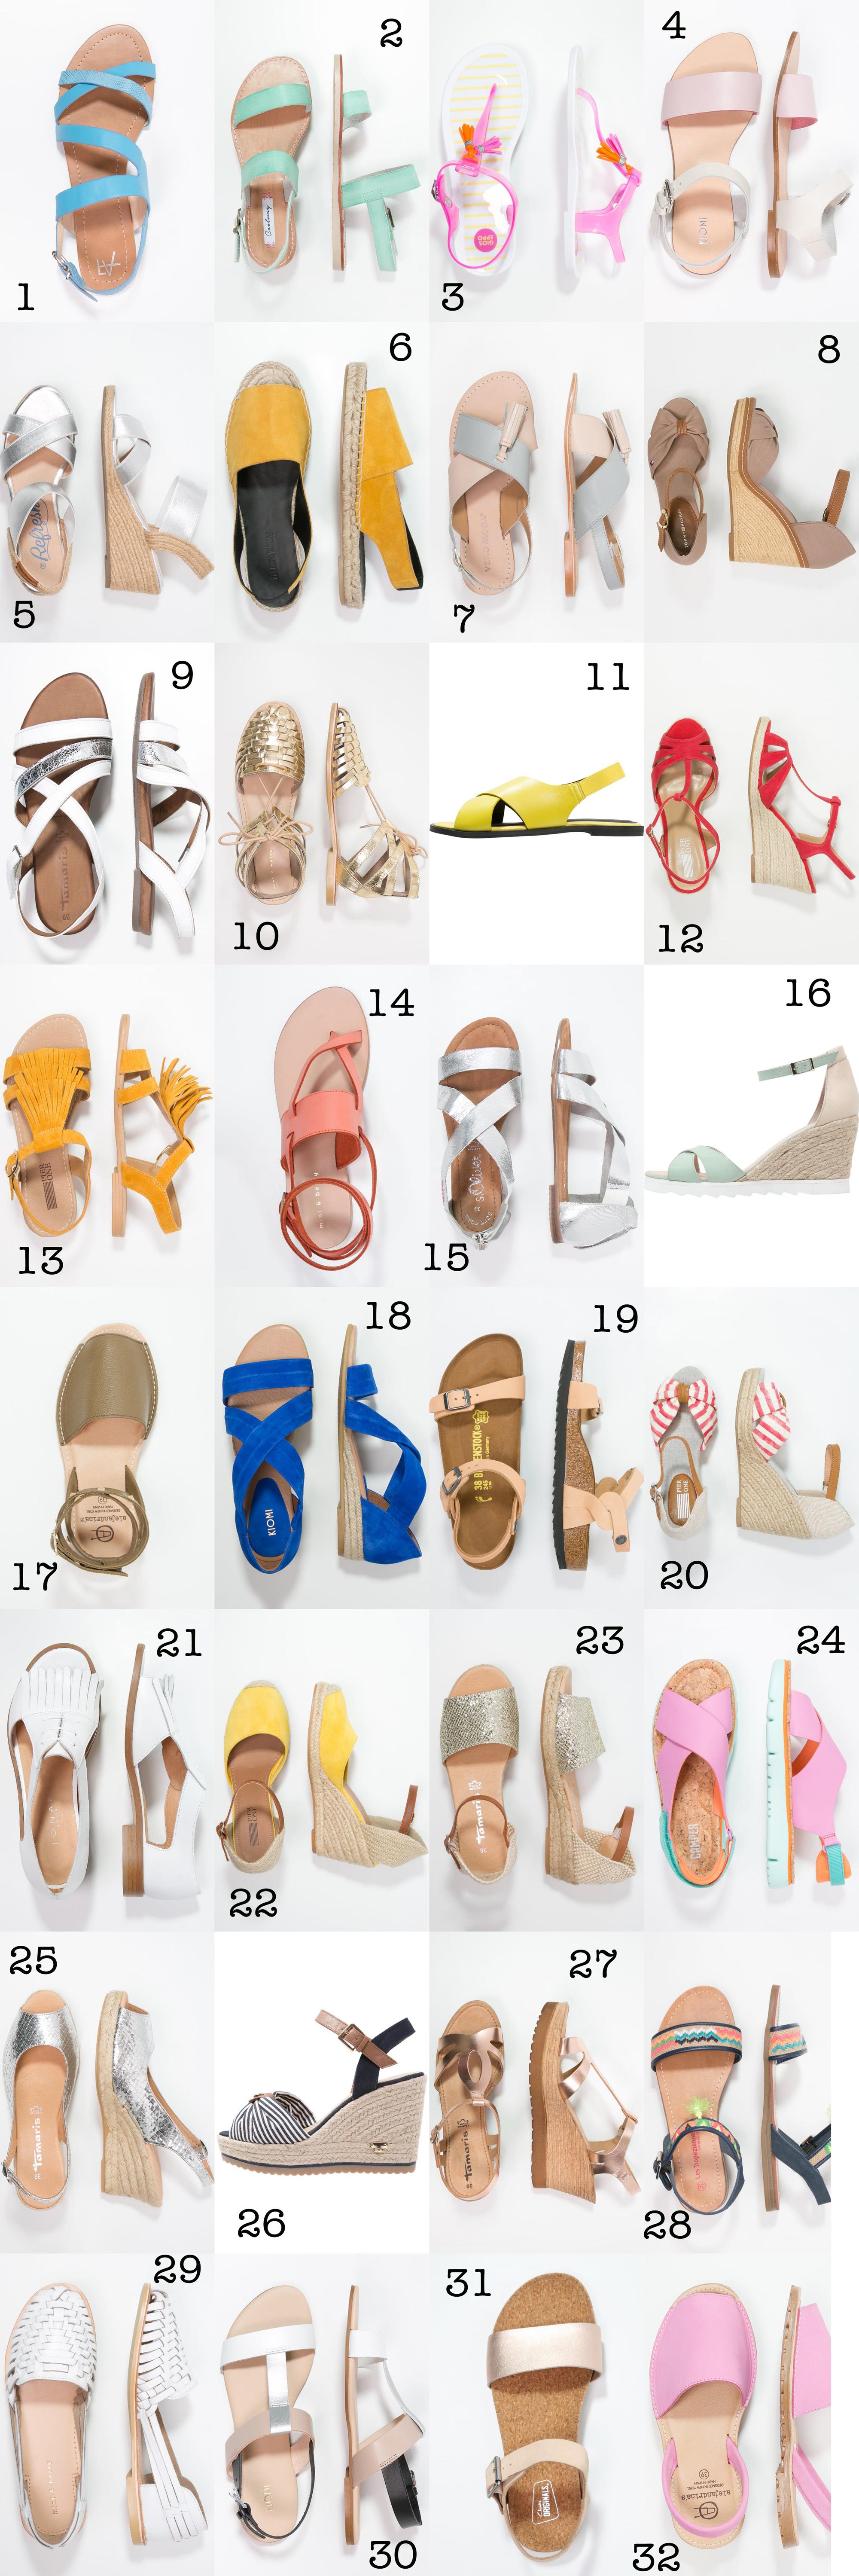 kupujemy-sandały-lato-2016